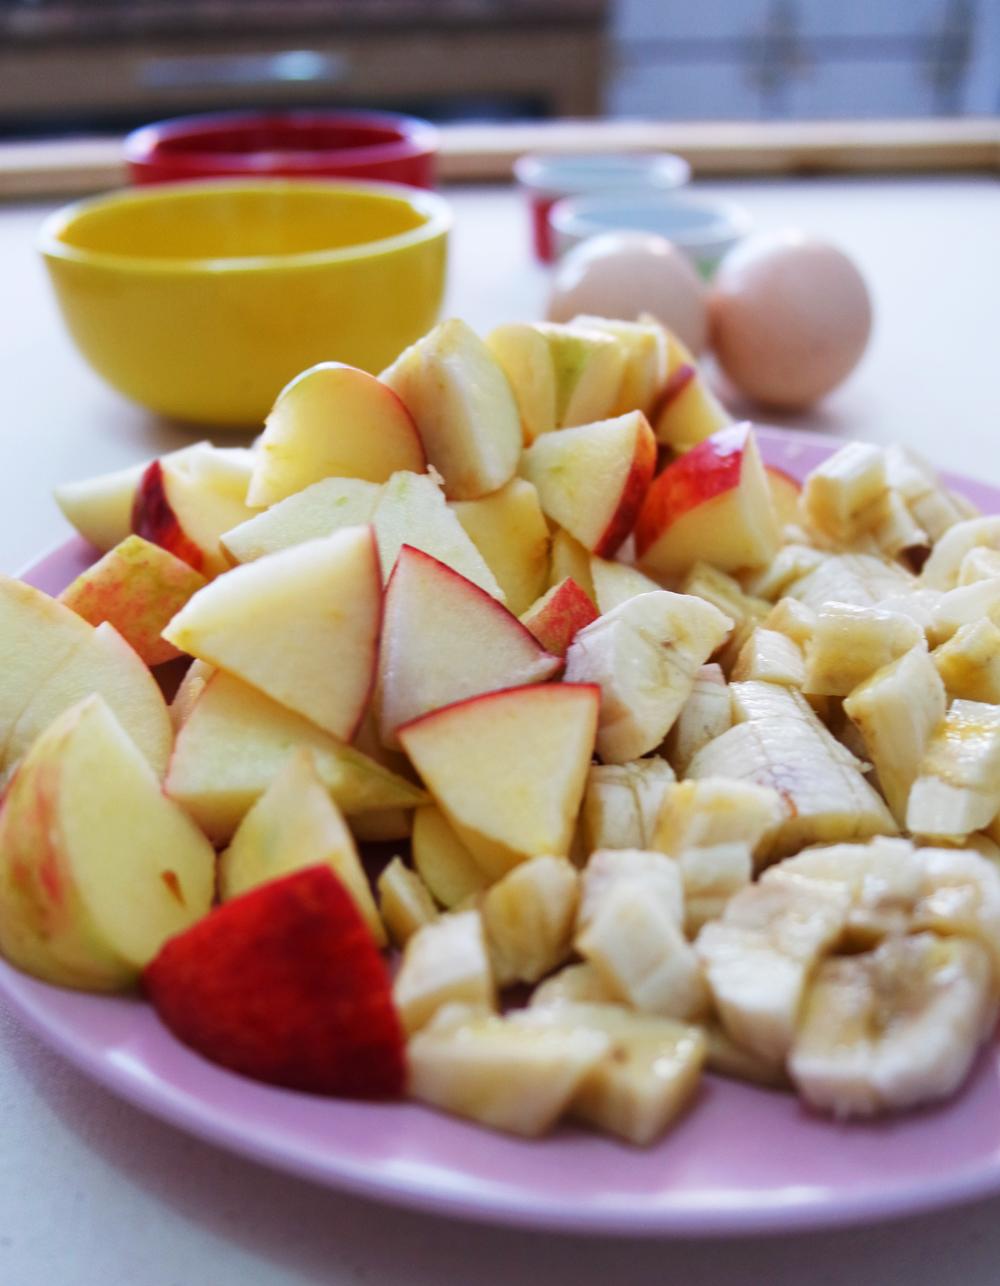 ingredientes-bolo-banana-maca